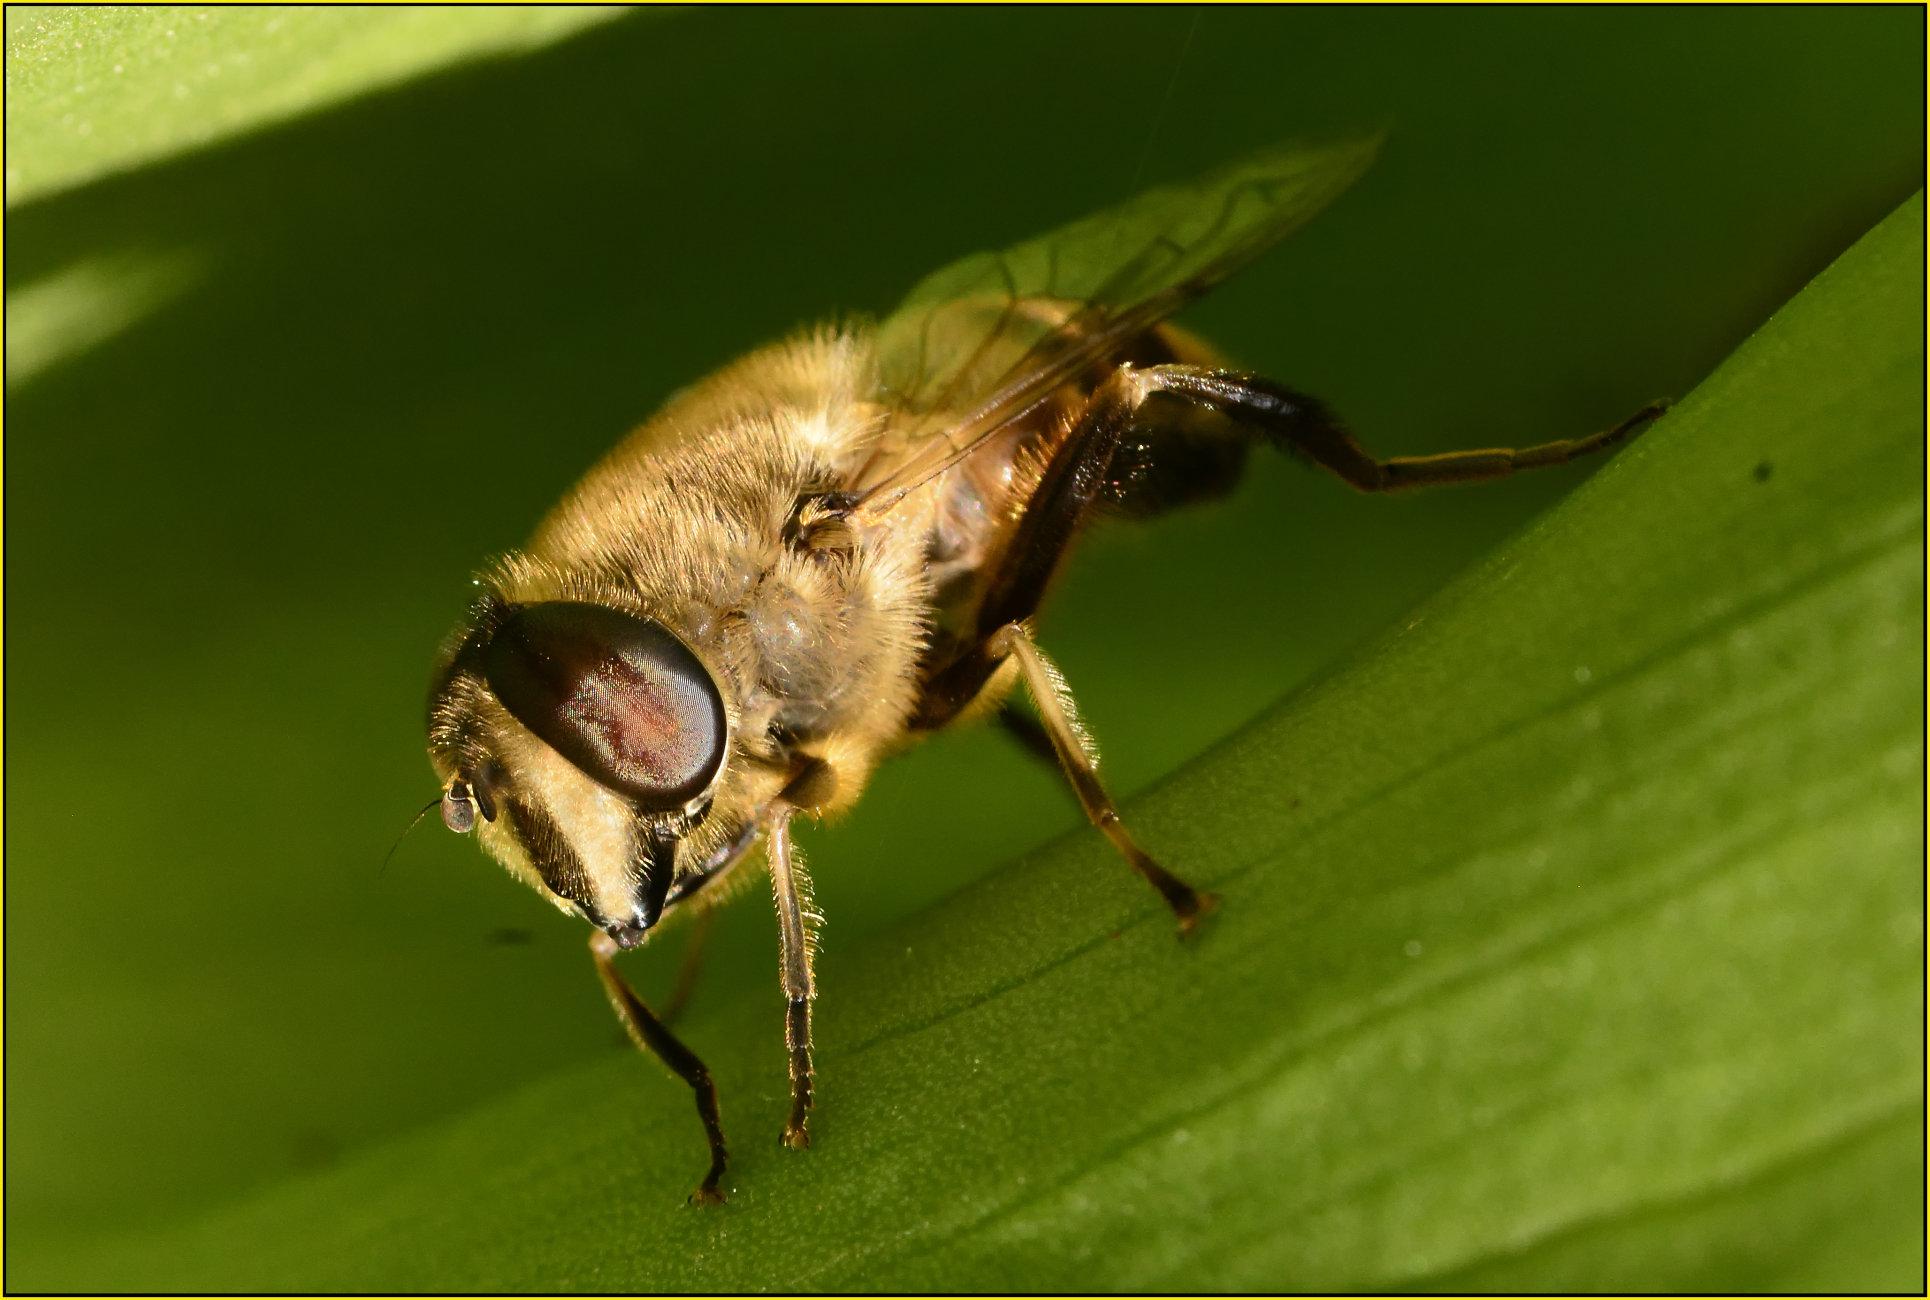 Bee resting on an Arum leaf